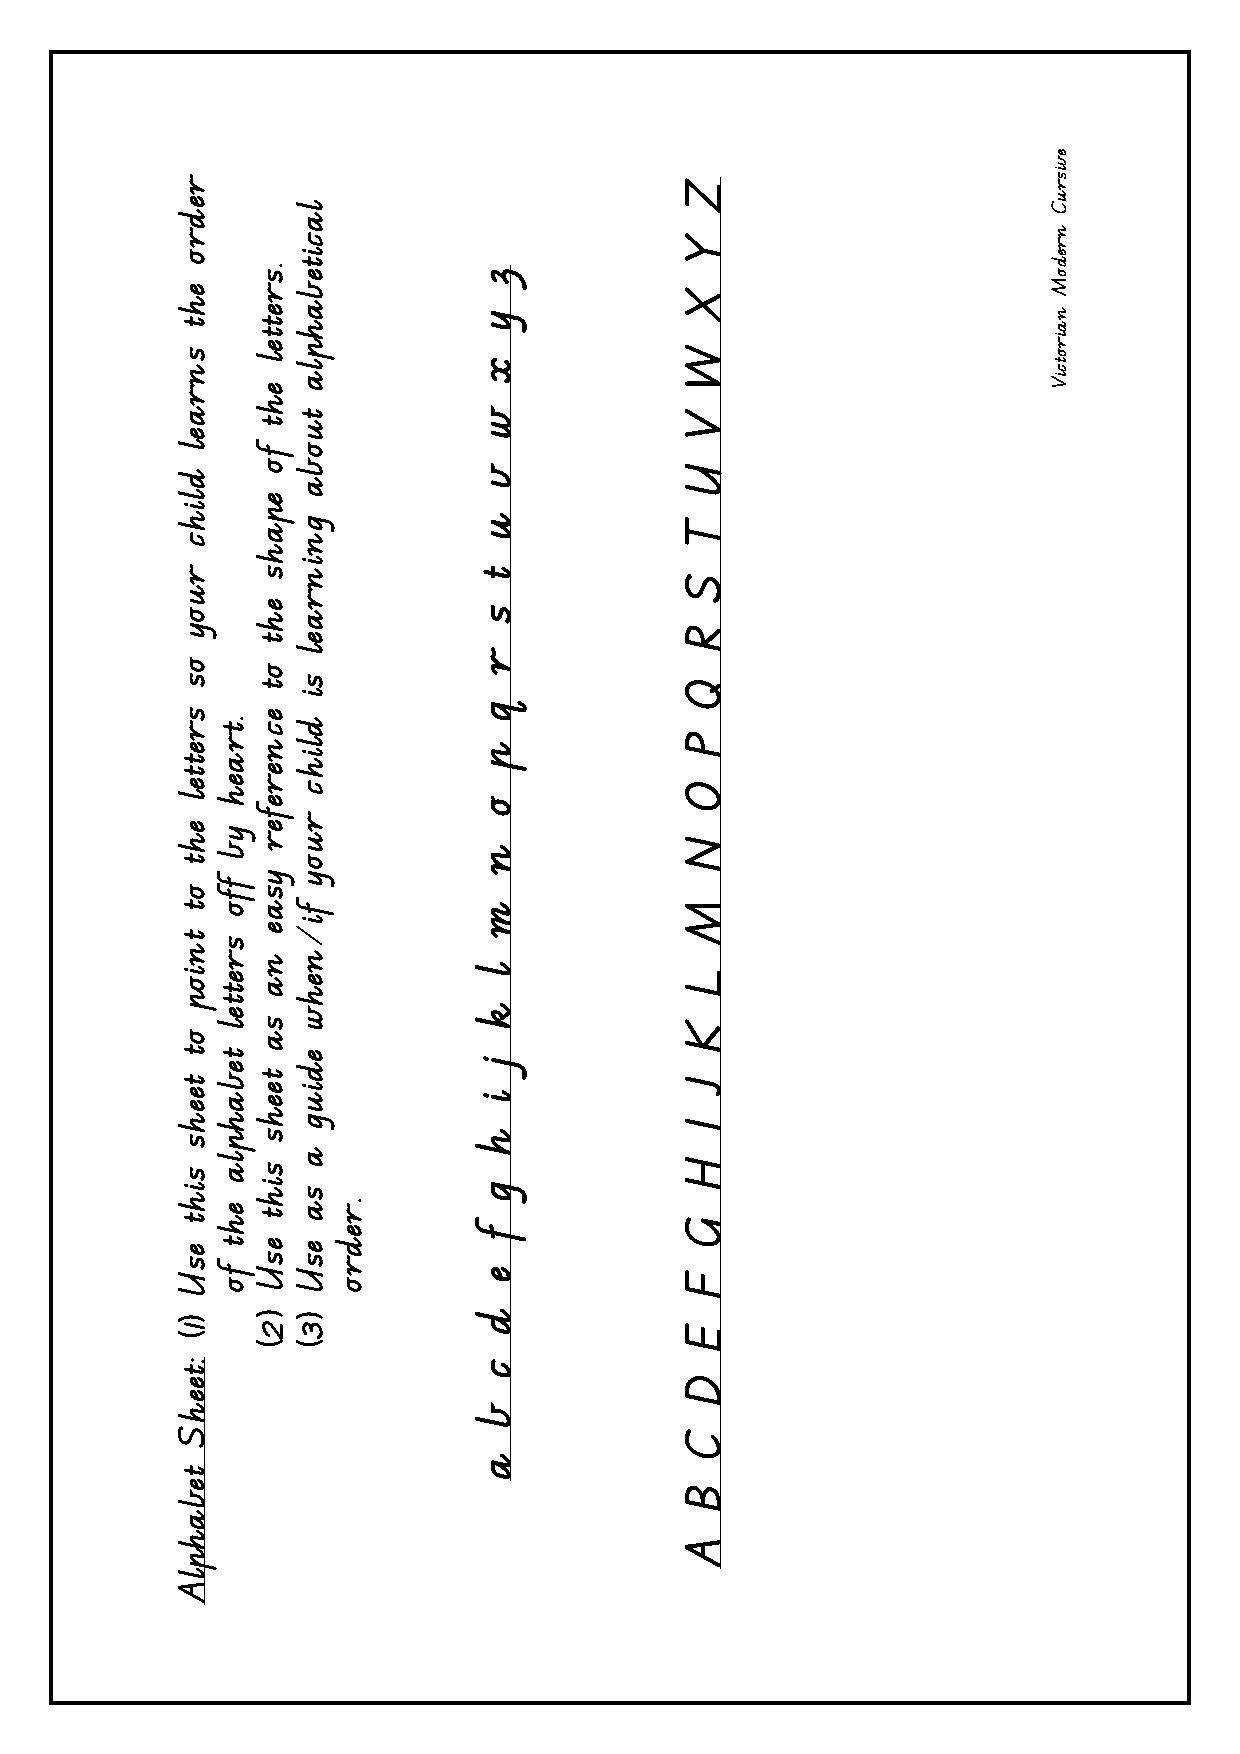 Lined Paper Handwriting Worksheets Free Printable Cursive Writing Worksheets Cursive Worksheets Cursive Writing [ 1754 x 1240 Pixel ]